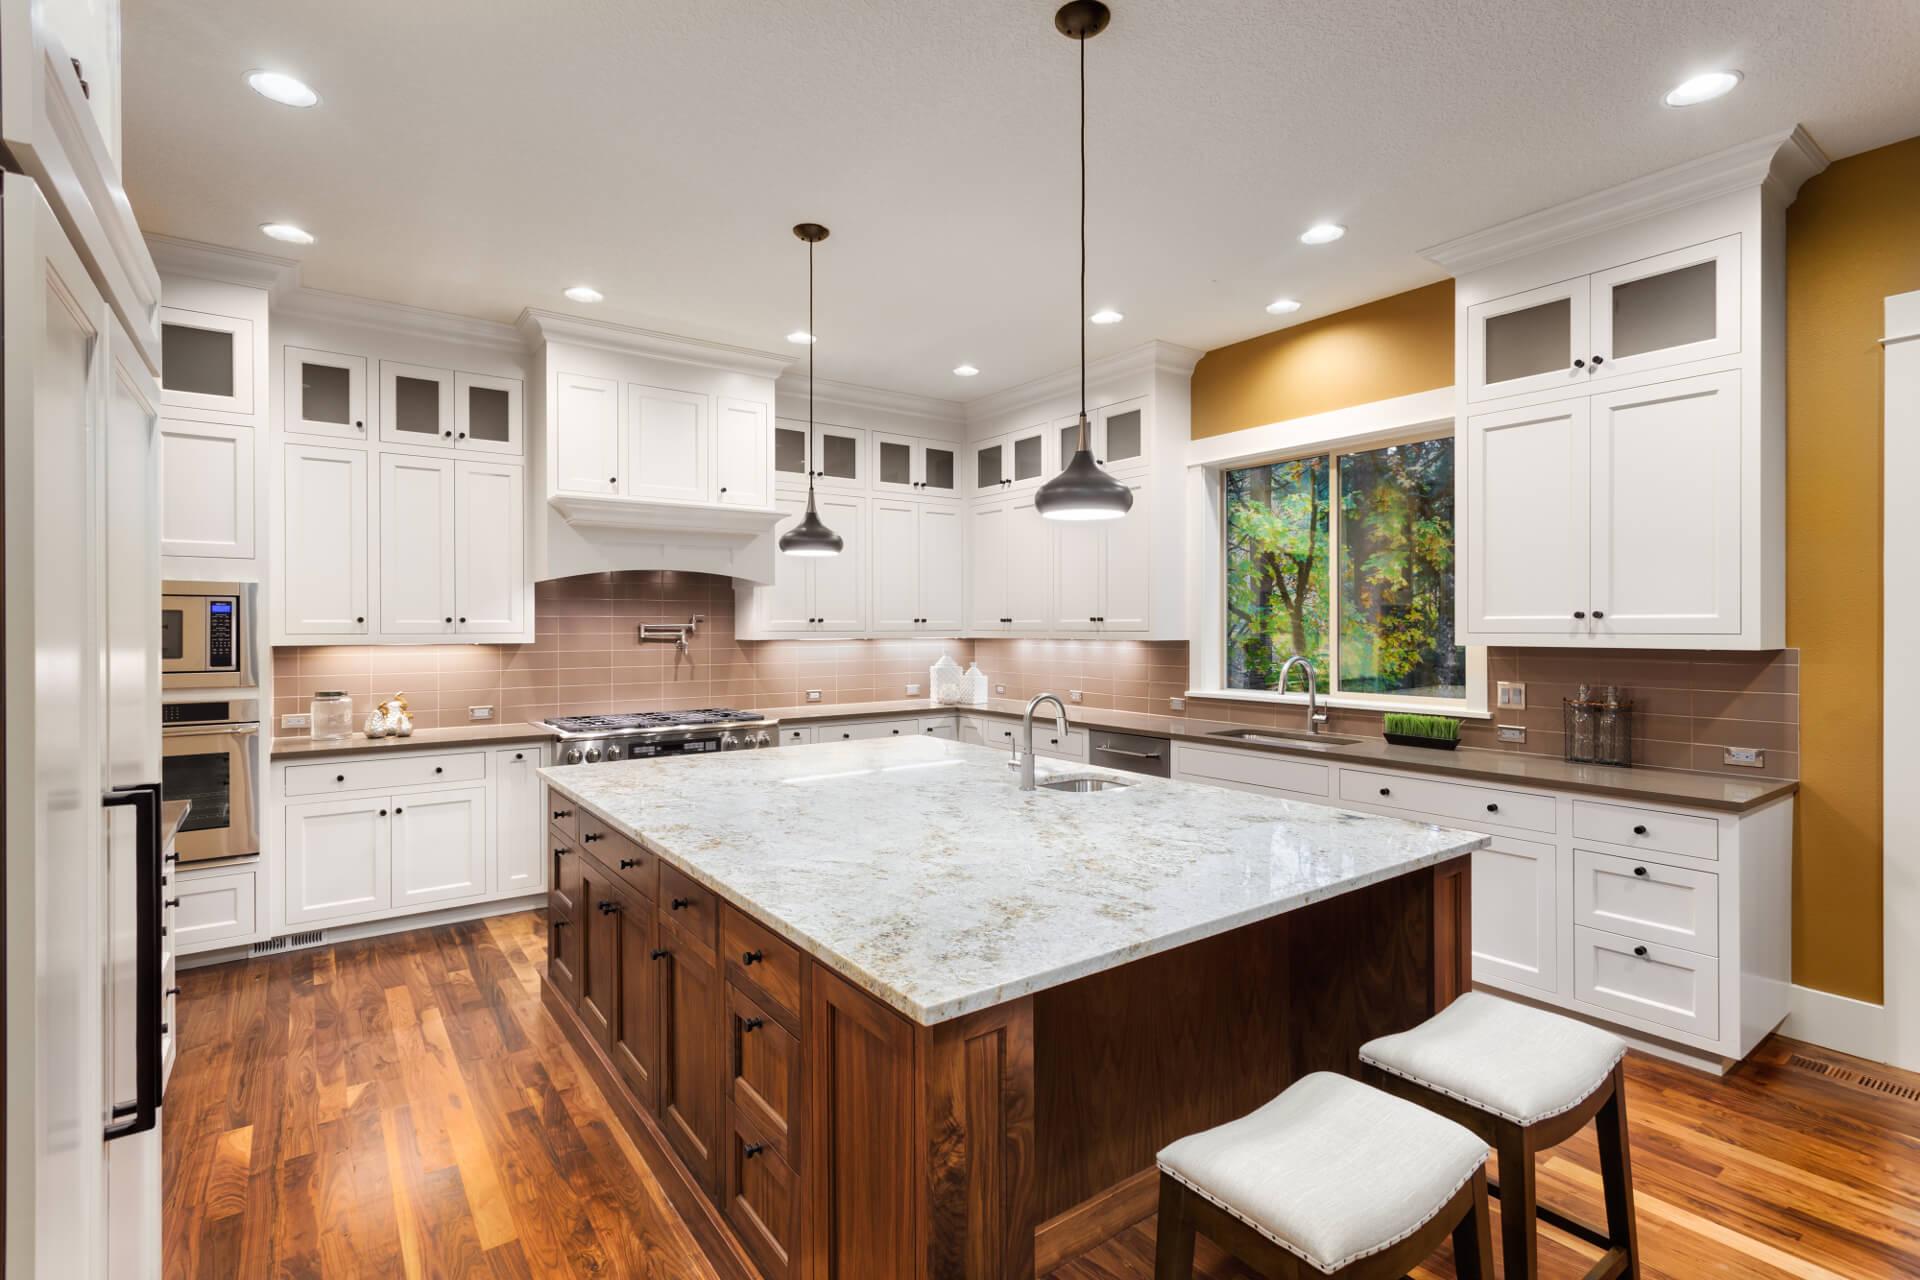 Kitchen Remodel Kitchen Island Kitchen Pendants Kitchen Cabinets